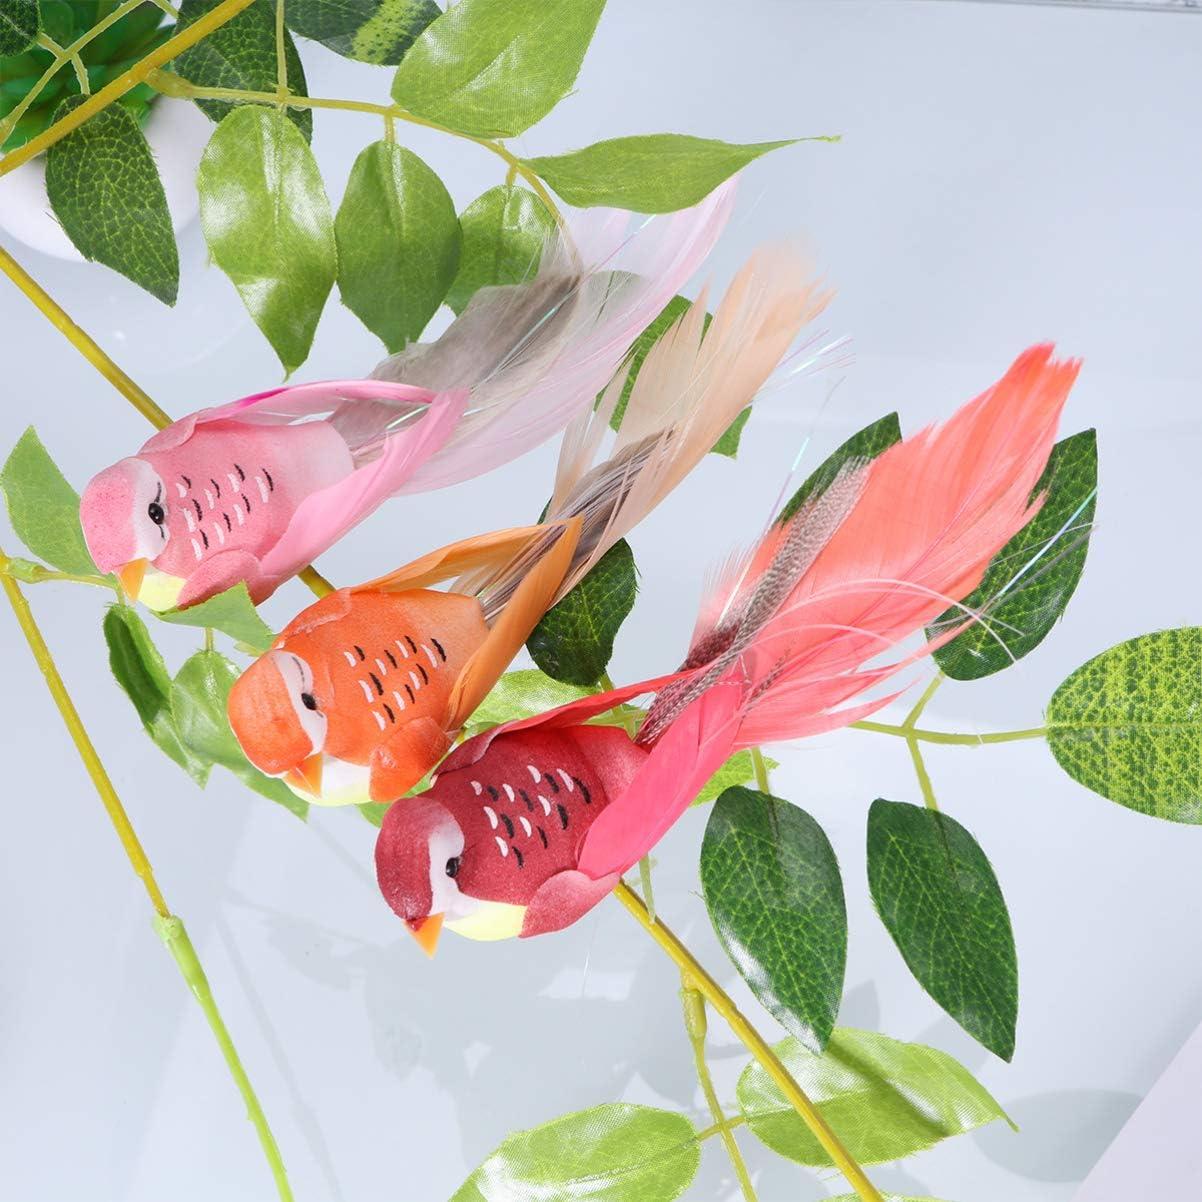 Amosfun Espuma Artificial Plumas p/ájaros Coloridos p/ájaros Falsos Regalo Juguetes DIY artesan/ía para favores de Fiesta decoraci/ón de jard/ín 12 Piezas